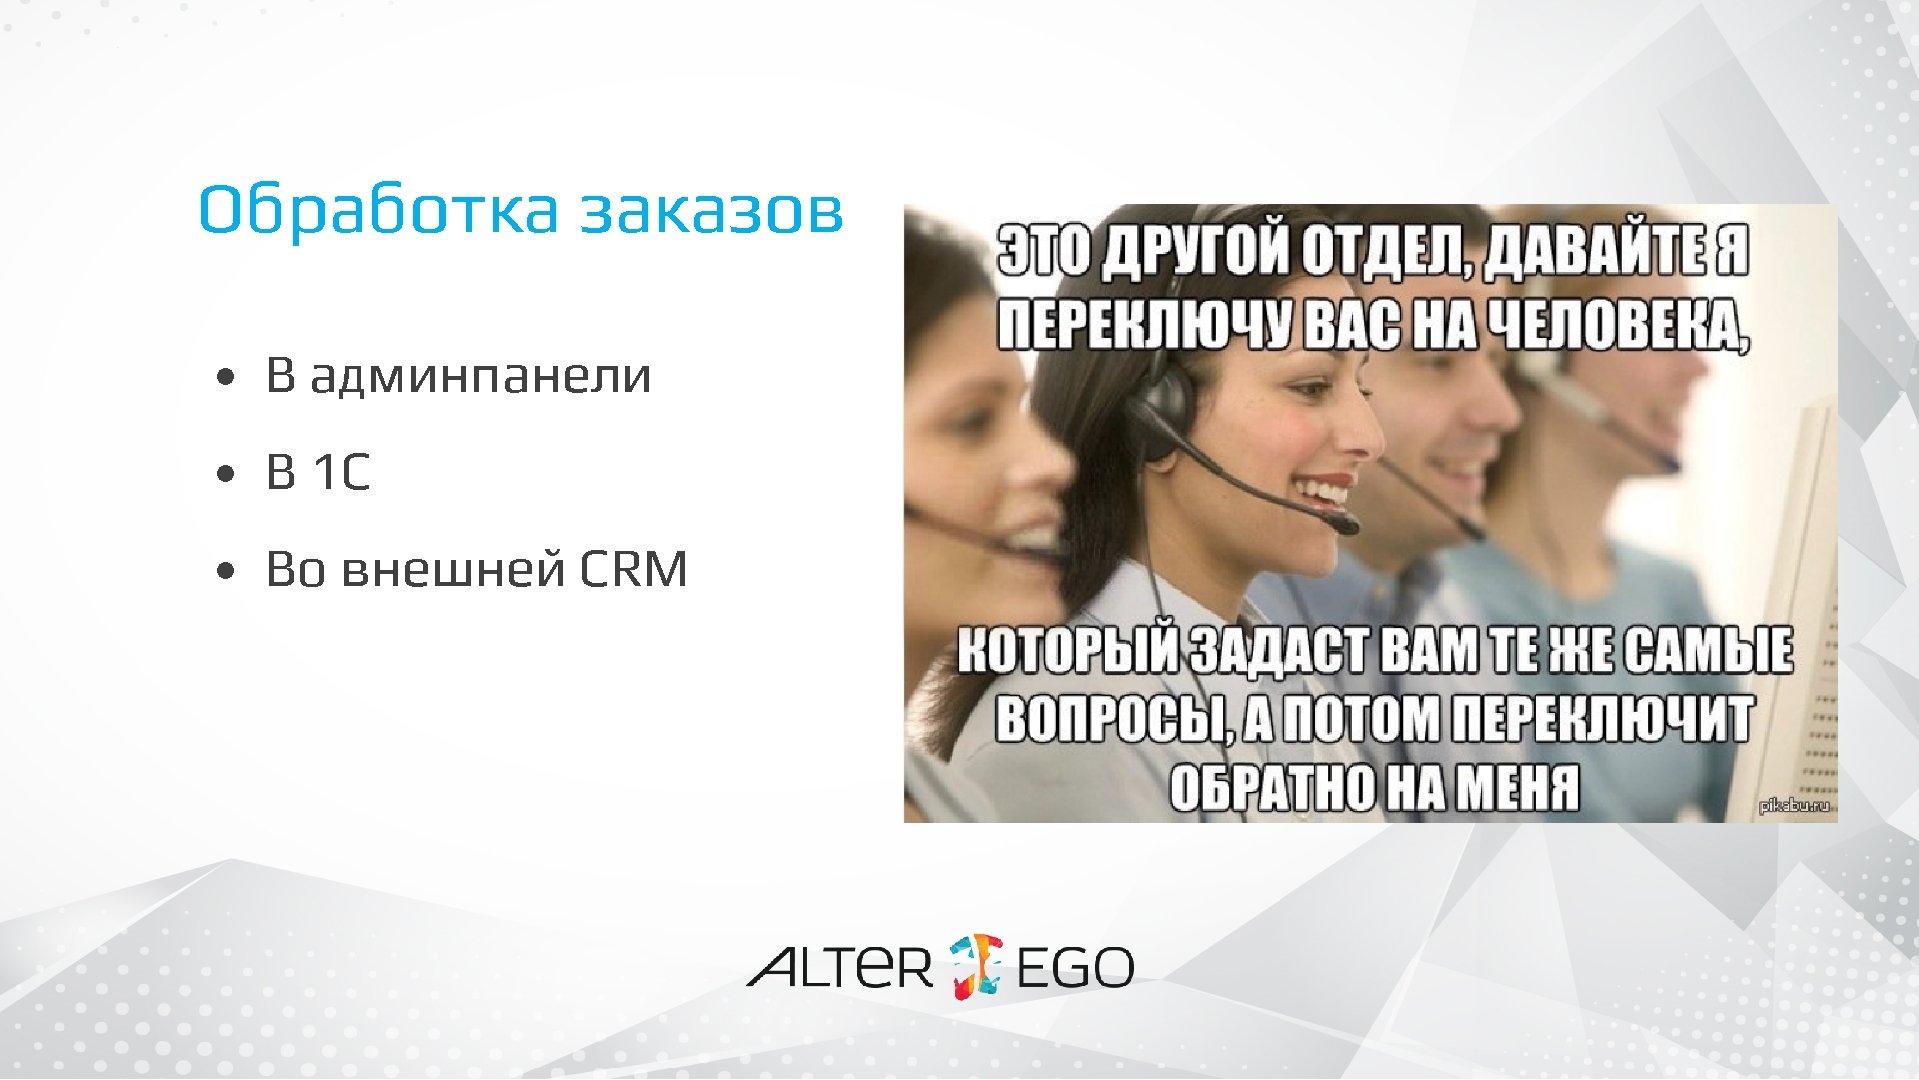 Обработка заказов • В админпанели • В 1 С • Во внешней CRM